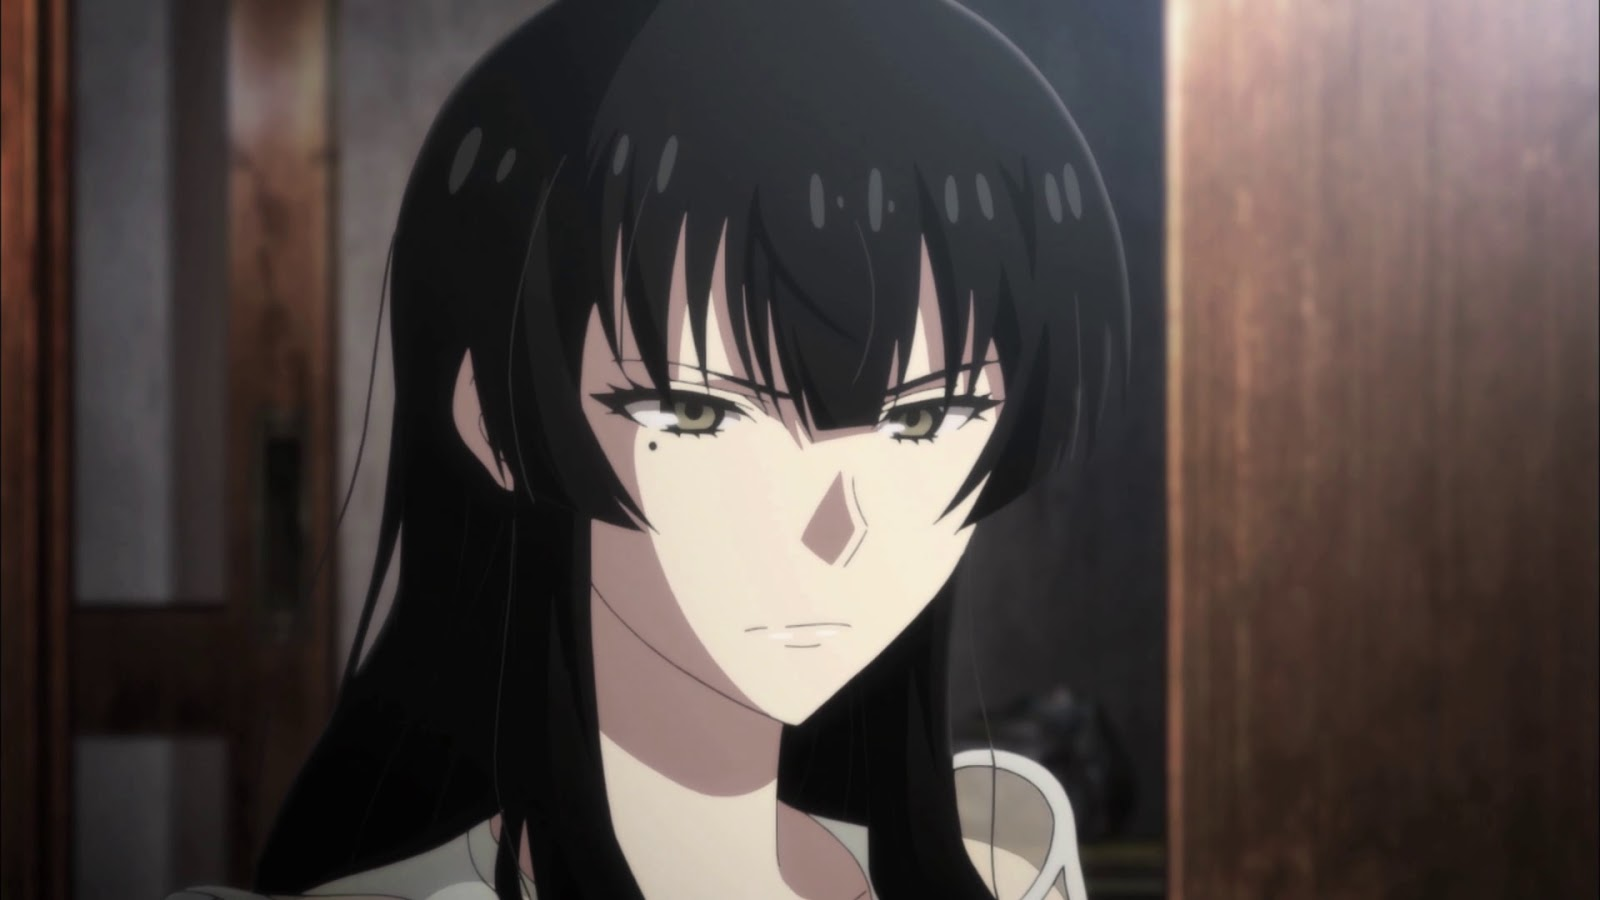 Onee San Dengan Oppai Yang Lumayan Berisi Postur Tinggi Kulit Putih Rambut Hitam Mole Dibawah Mata Kanannya Ini Termasuk Dalam Karakter Anime